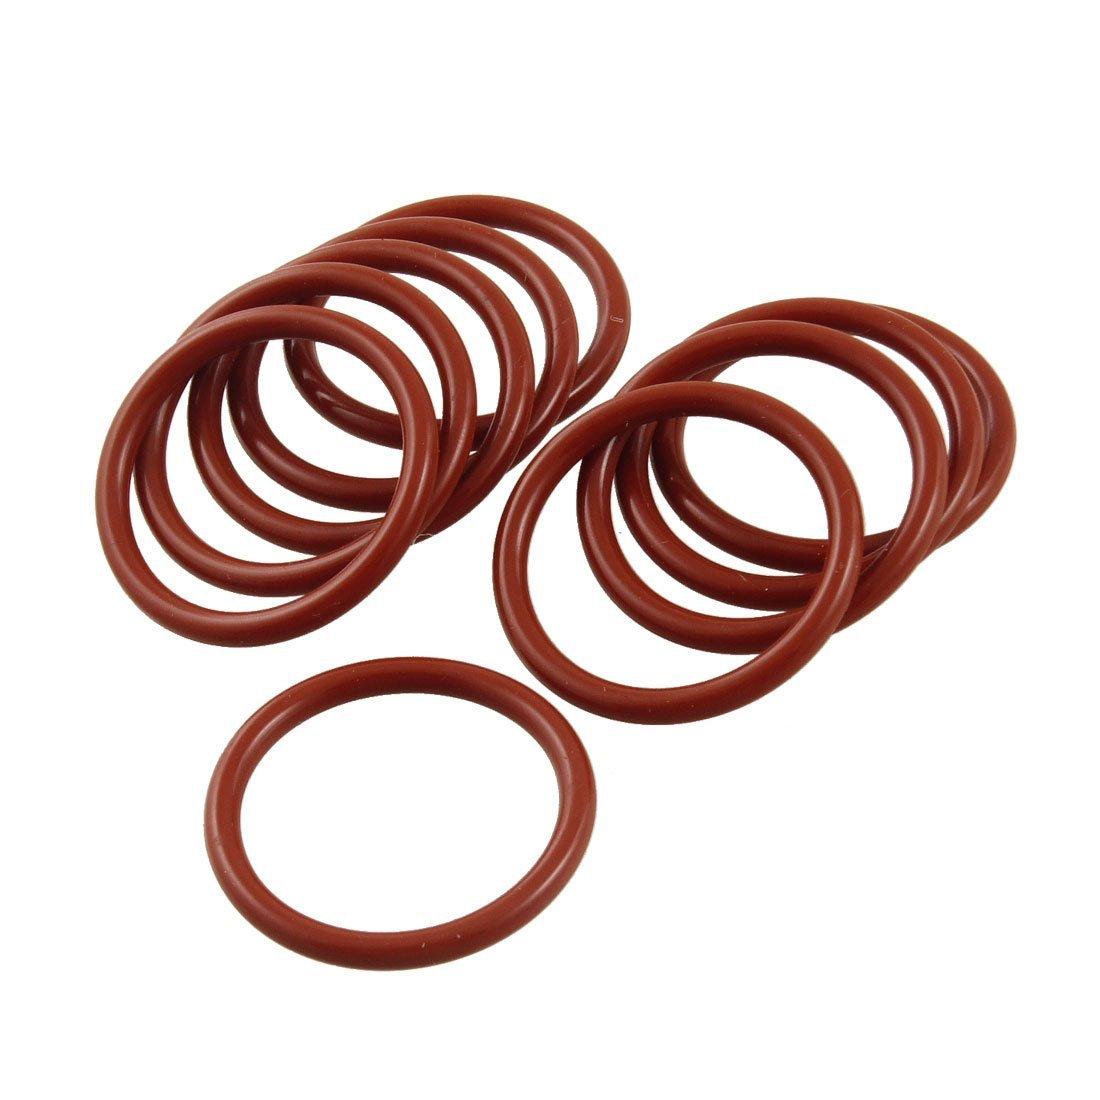 50 stück Dichtungsring O-Ring Gummi Dichtung Öldichtung 29mm x 35mm x 3mm